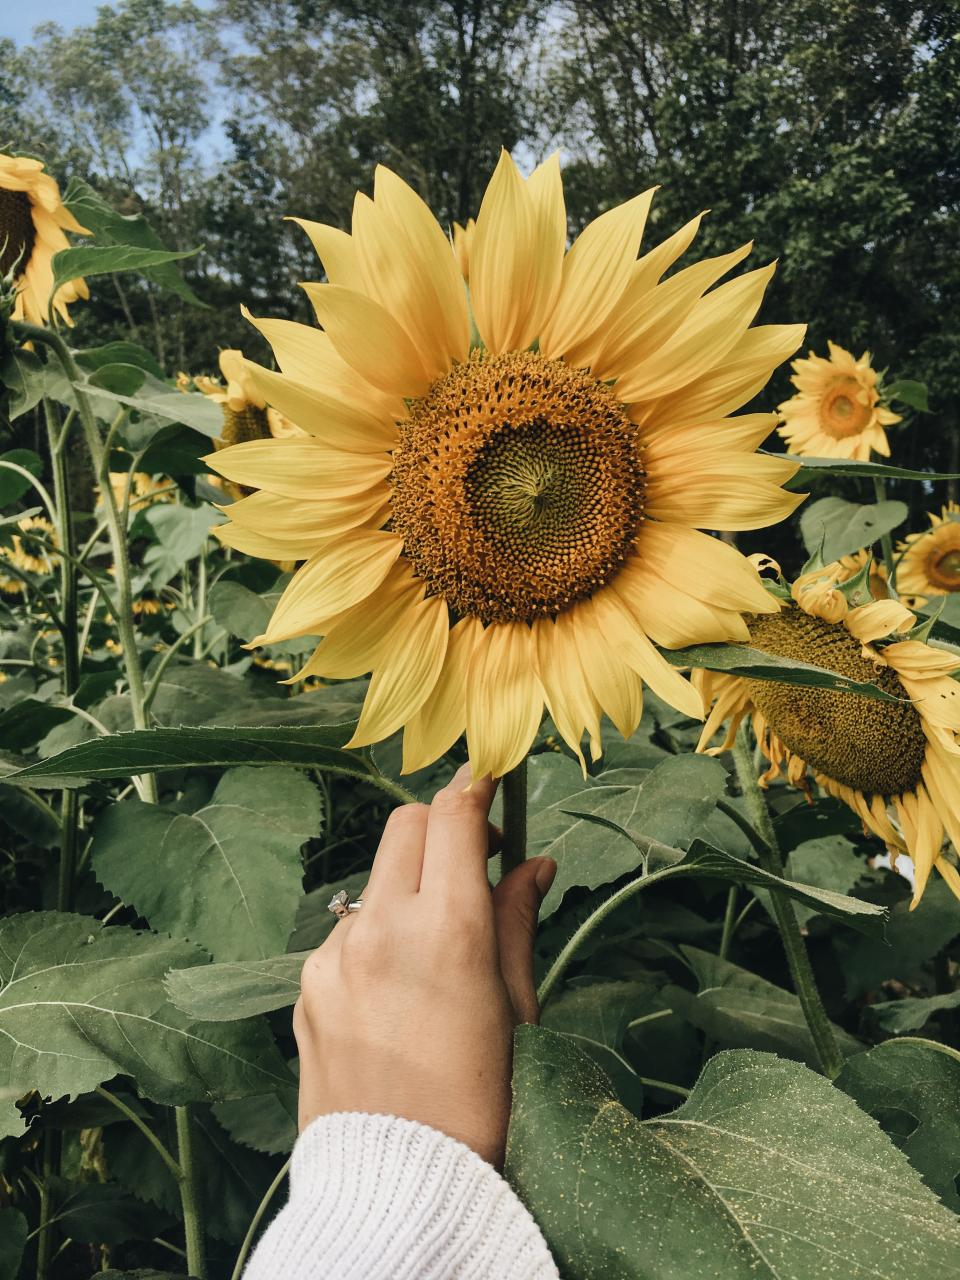 sunflower, yellow, petal, field, farm, garden, nature, plant, sky, trees, hand